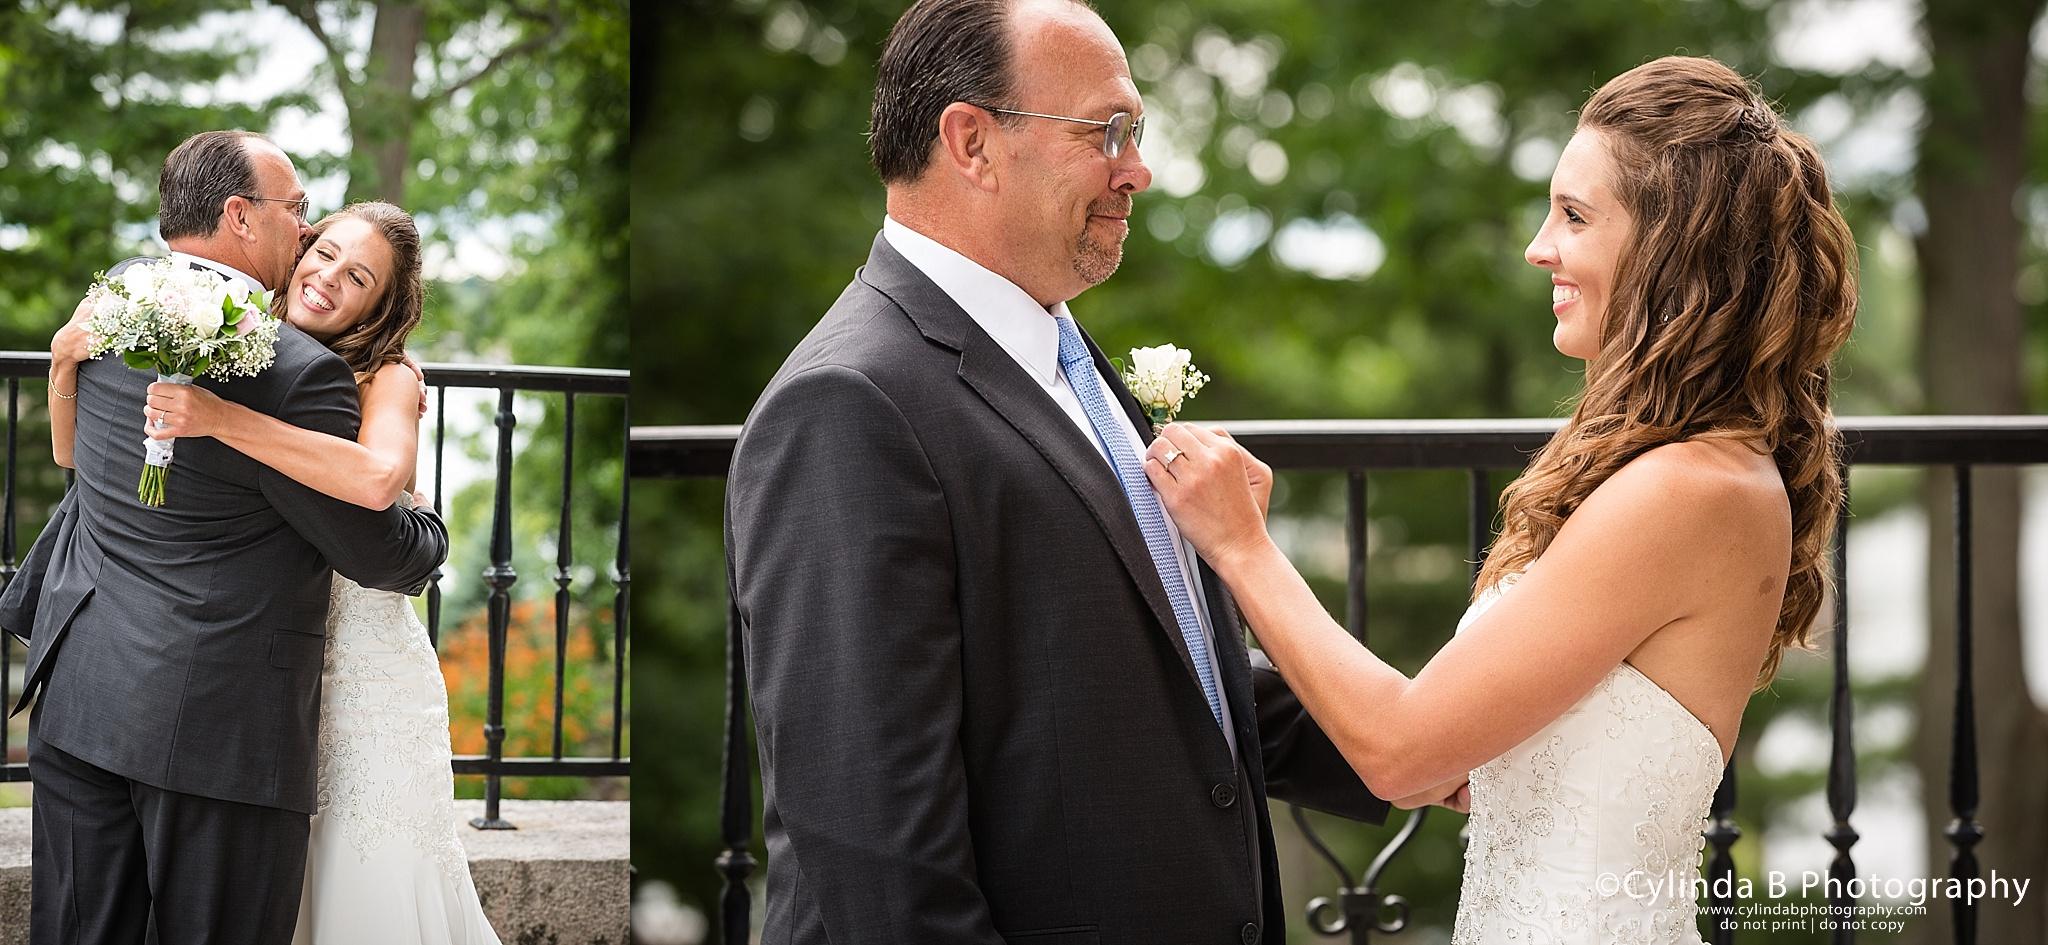 Boldt Castle Wedding, Alexandria Bay, Wedding, Photograper, Cylinda B Photography-15